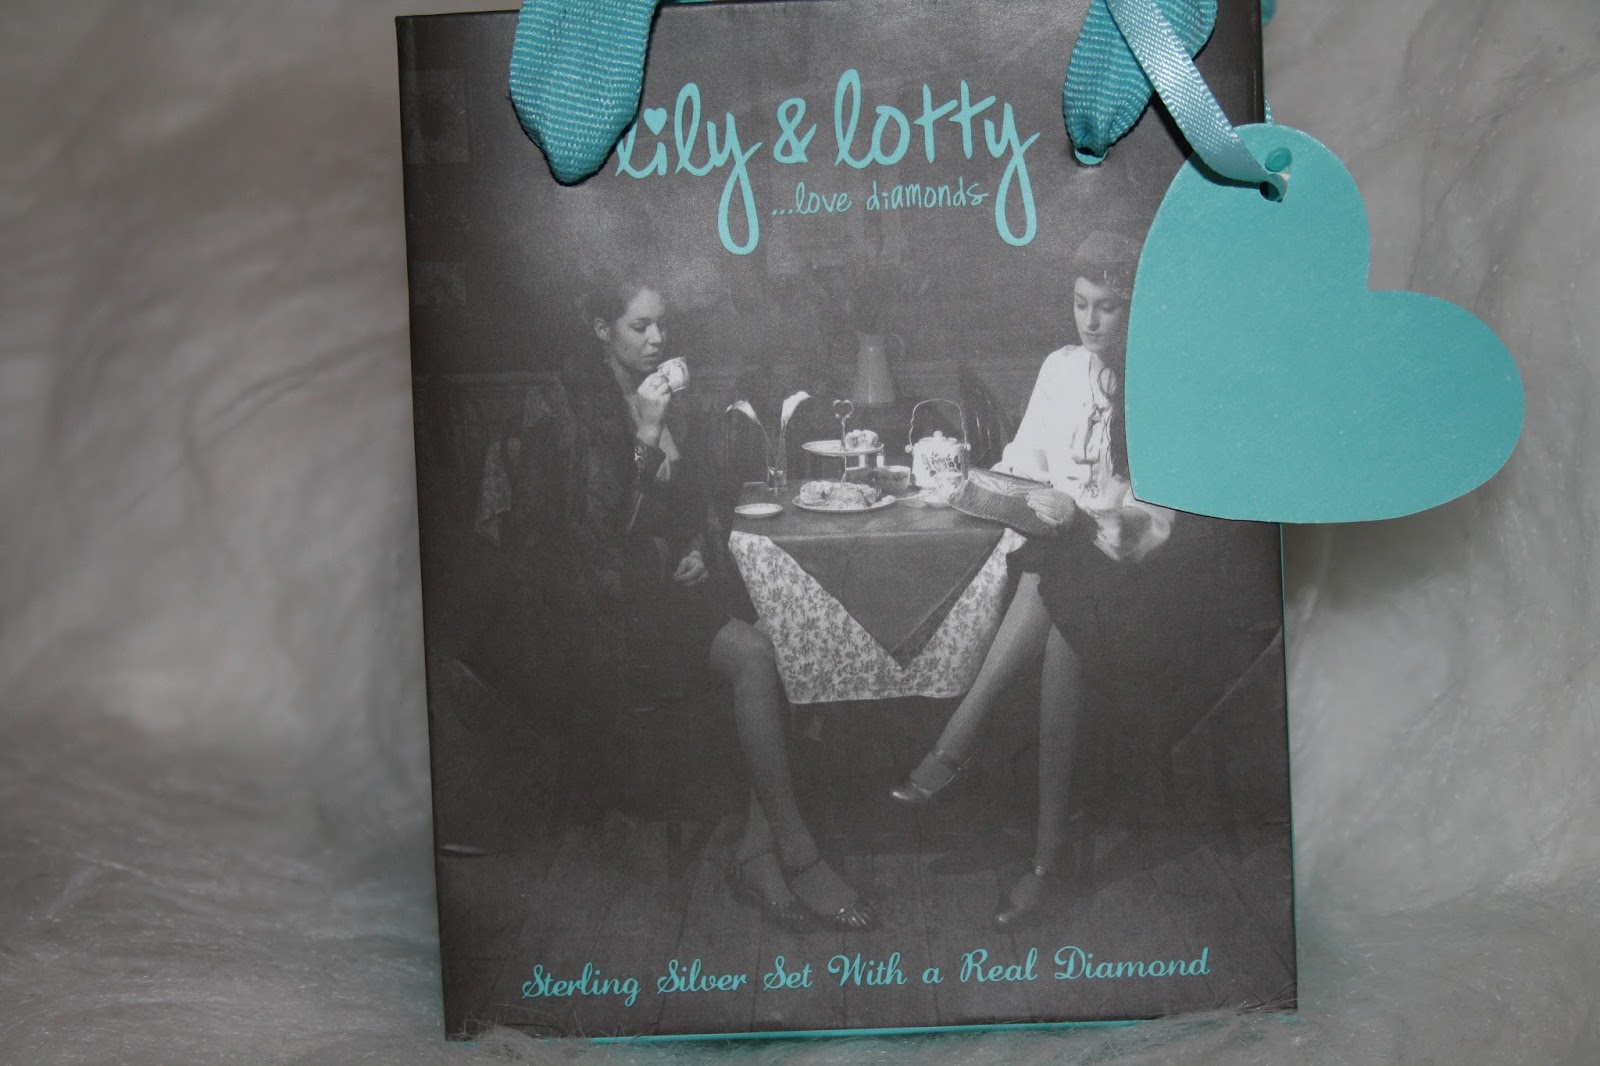 Lily & Lotty Jewellery